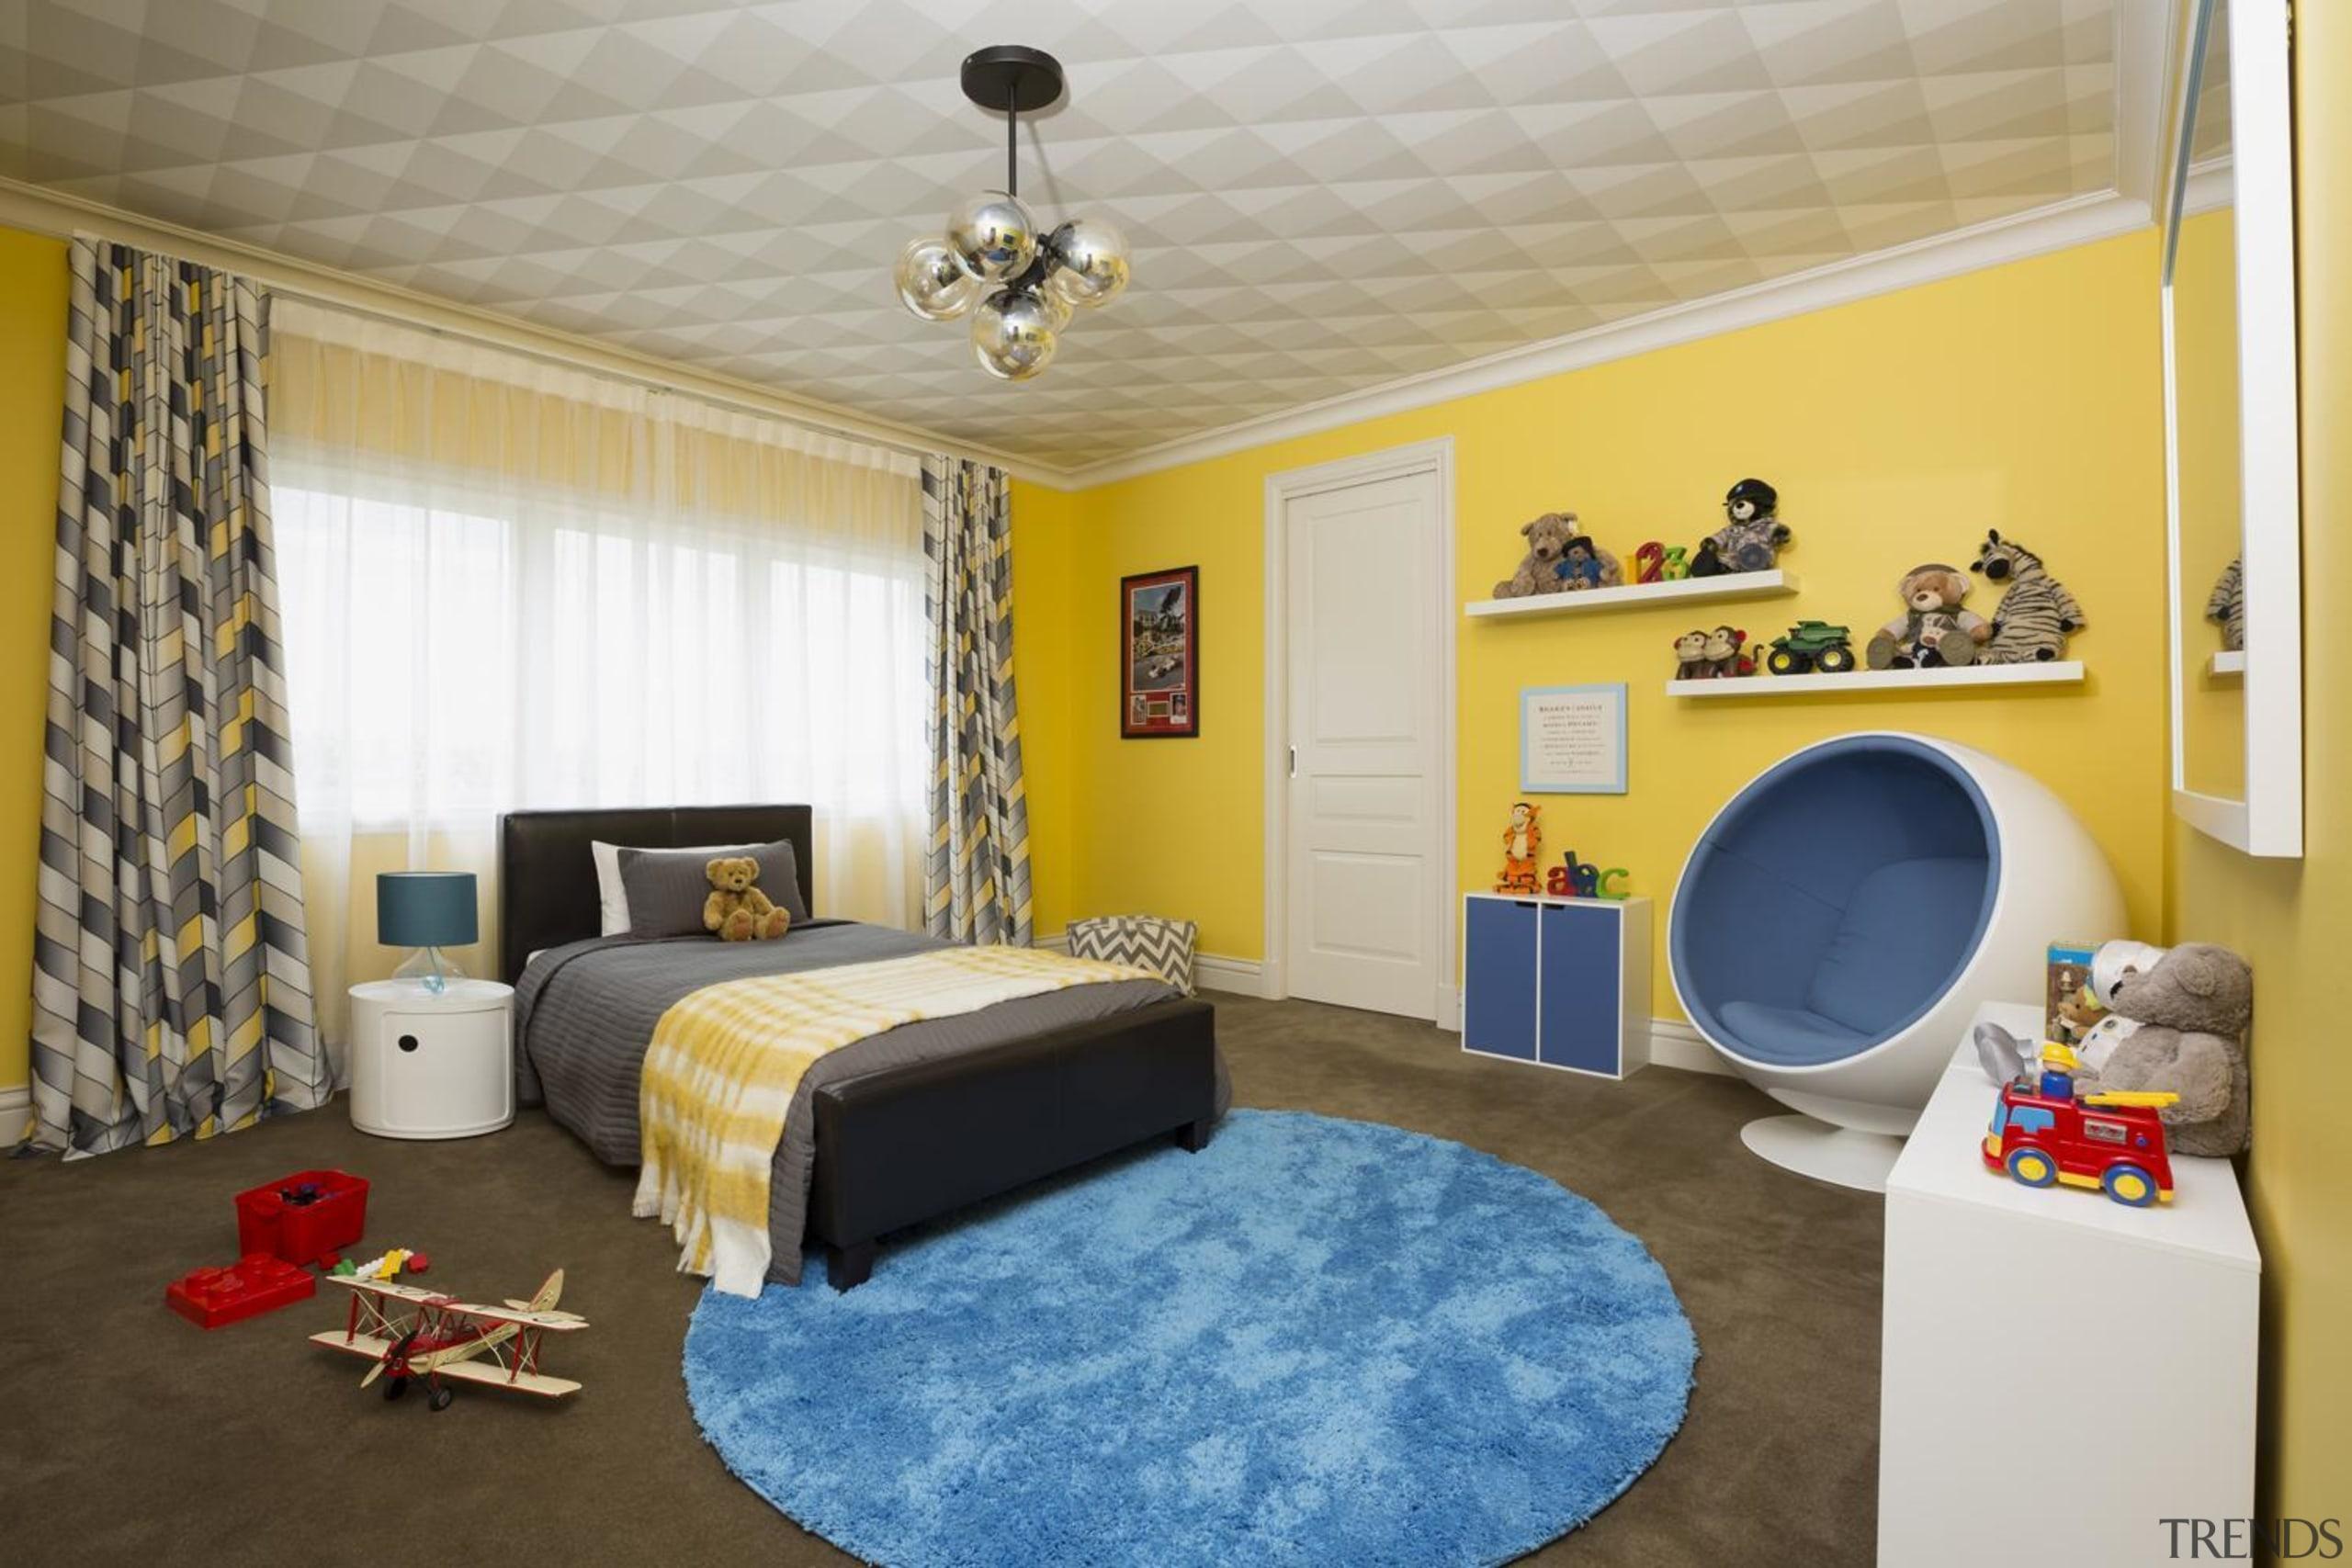 Childrens Bedroom - bedroom   ceiling   home bedroom, ceiling, home, interior design, property, real estate, room, wall, gray